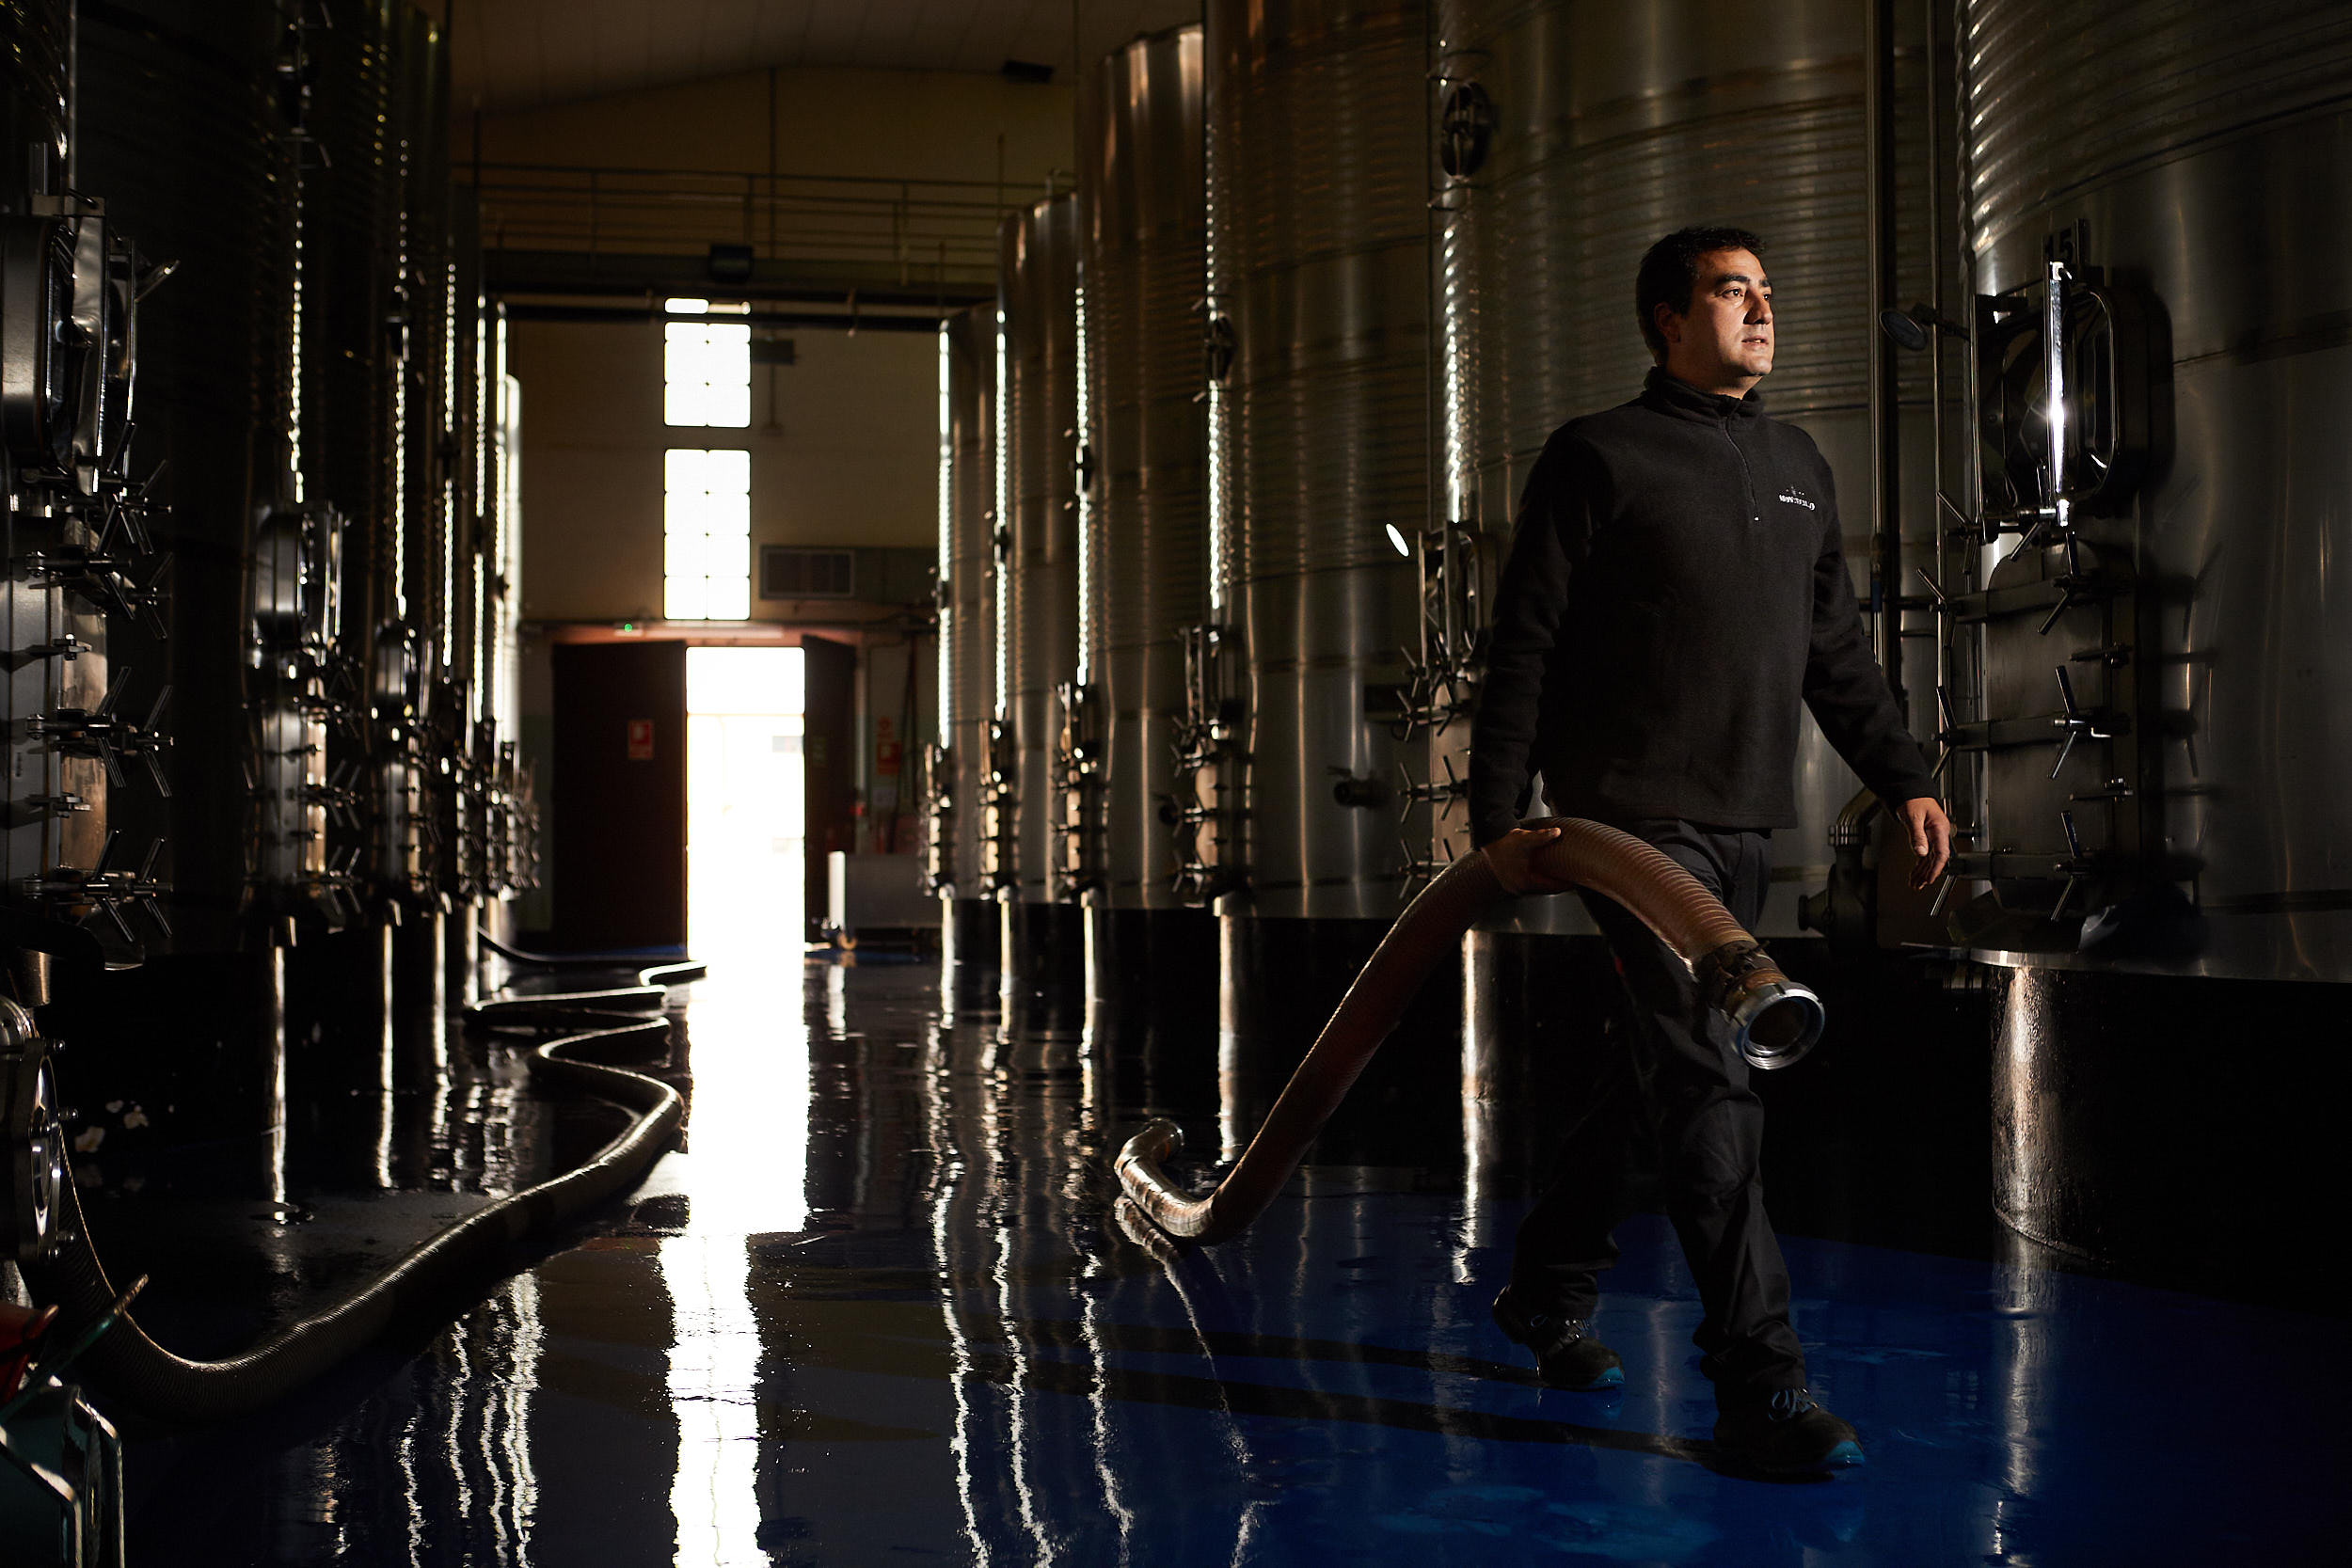 1805Commercial-professional-wine-photography-la-rioja-spain-James-Sturcke_0016.jpg